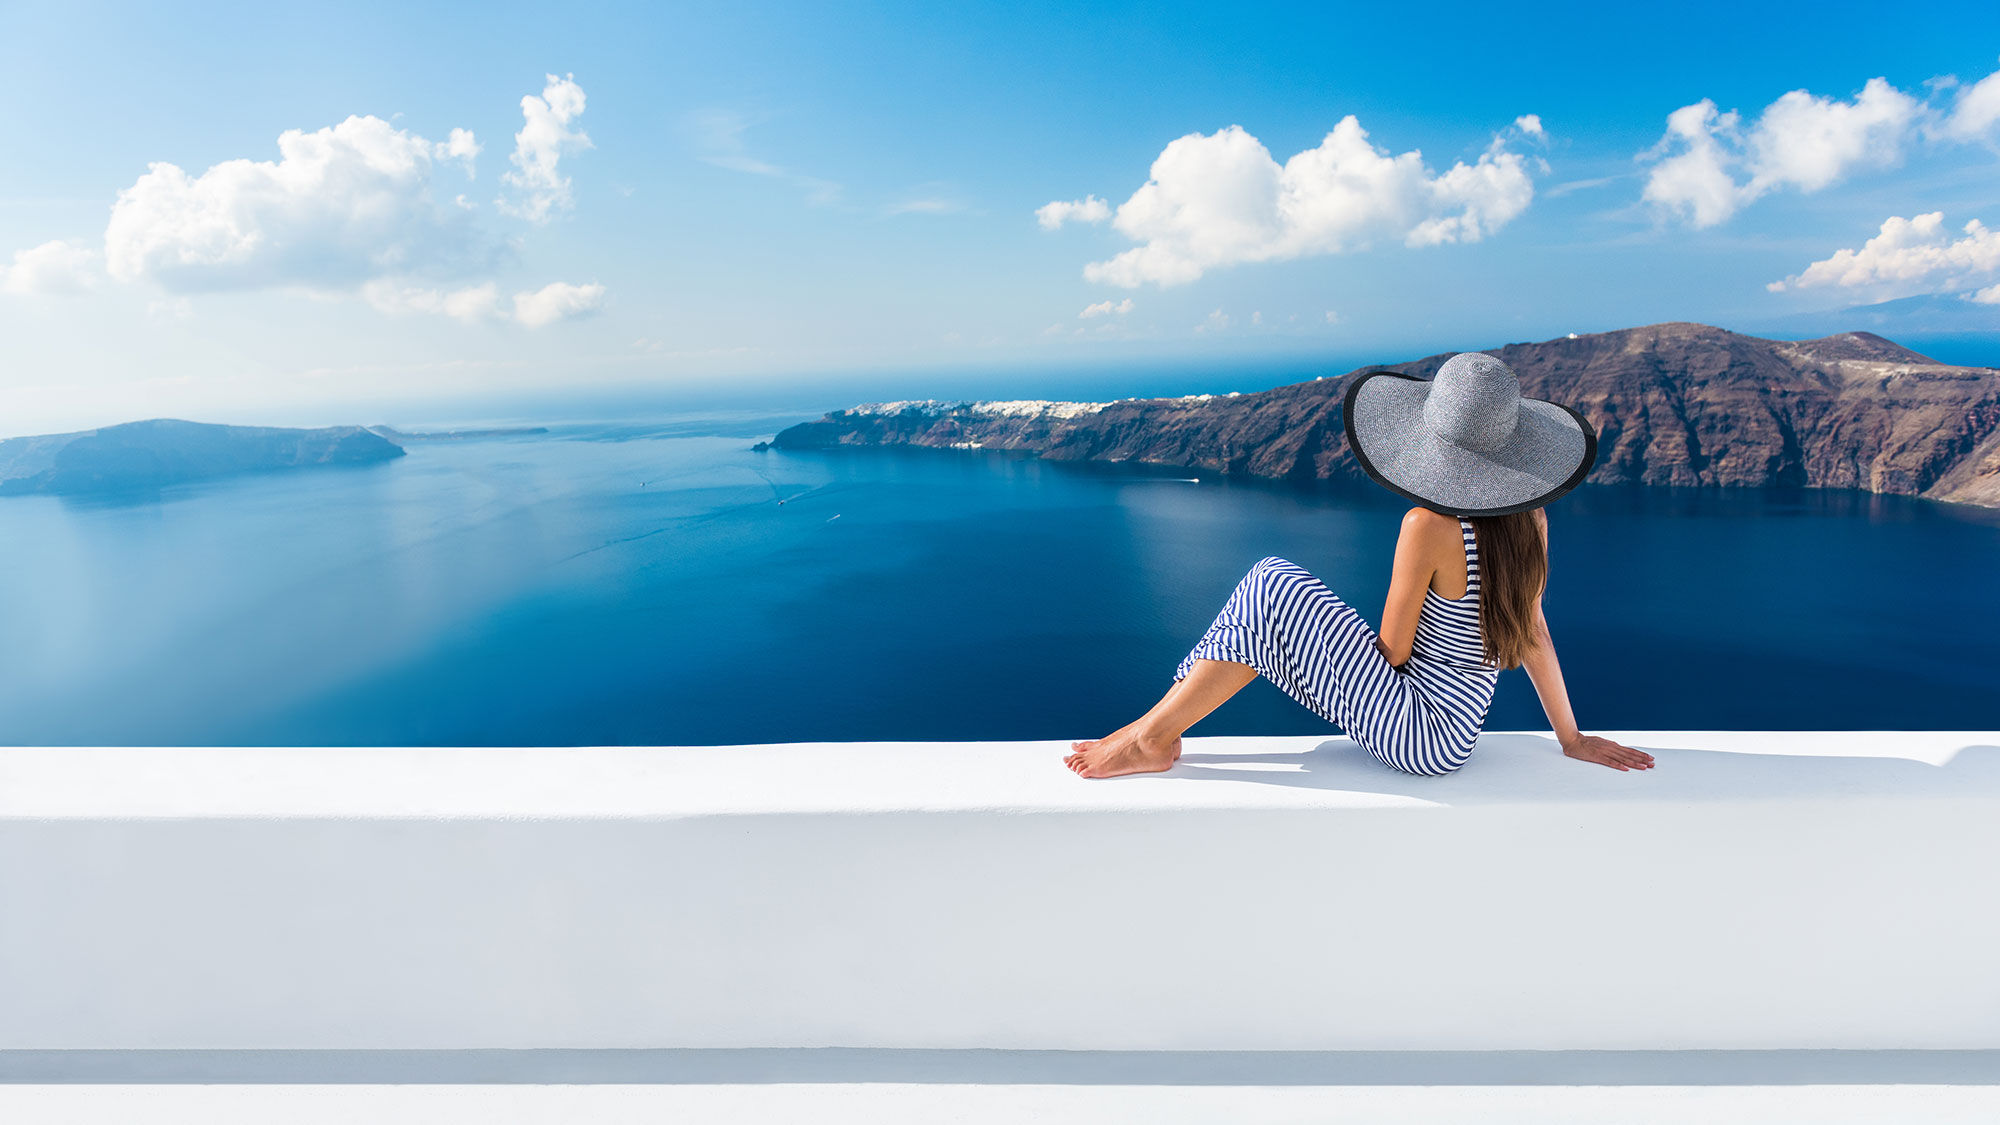 Luxury traveler [Credit: Maridav/Shutterstock.com]